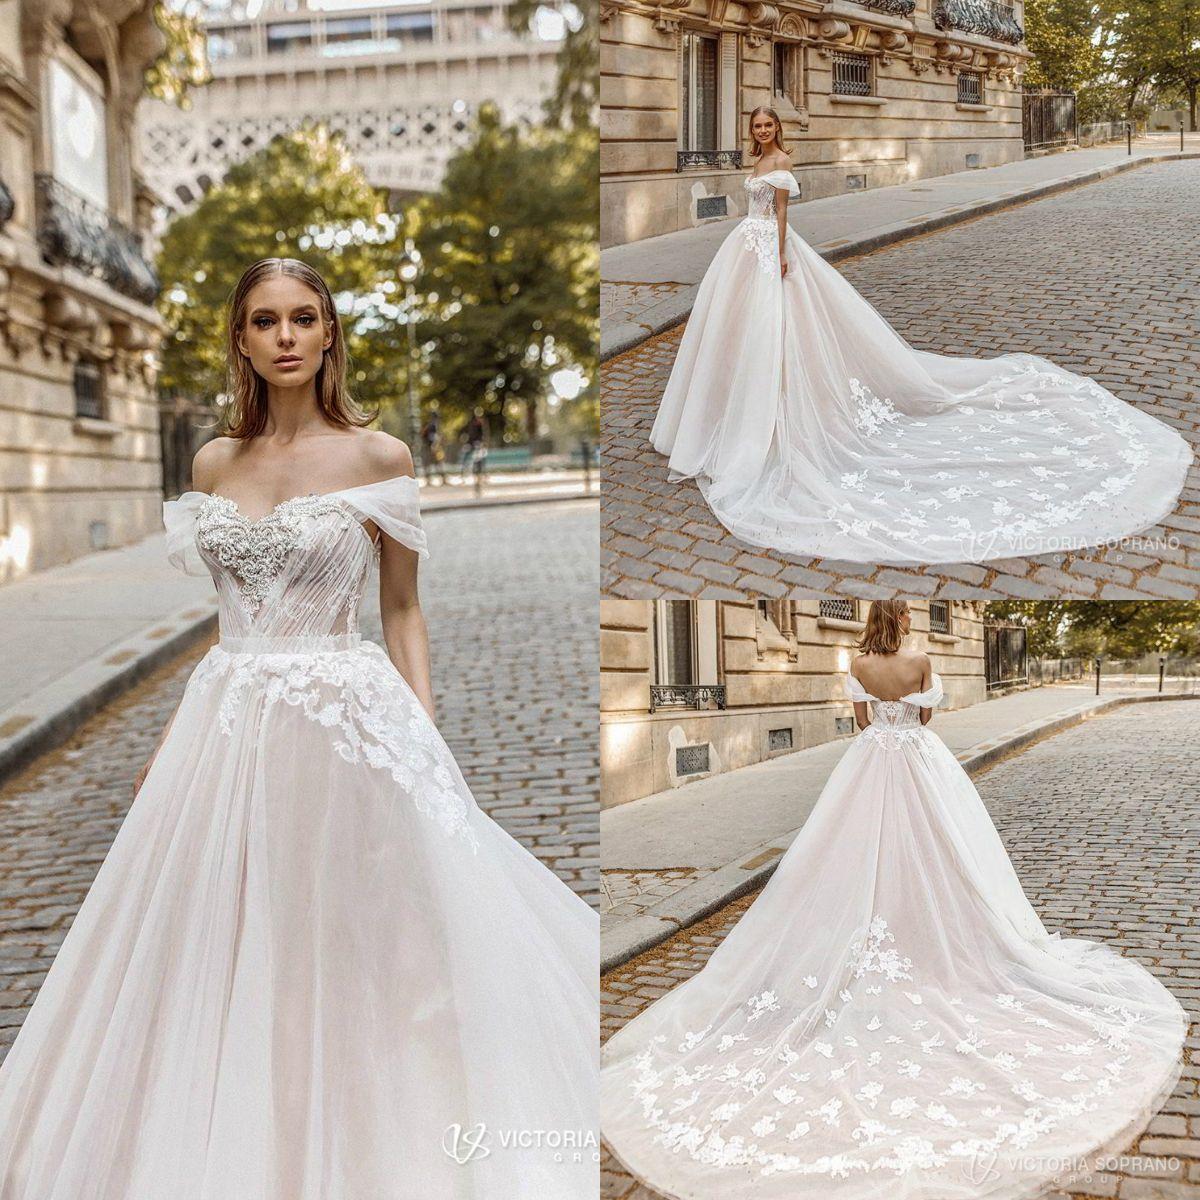 Discount Victoria Soprano 2019 Wedding Dresses Off Shoulder Lace